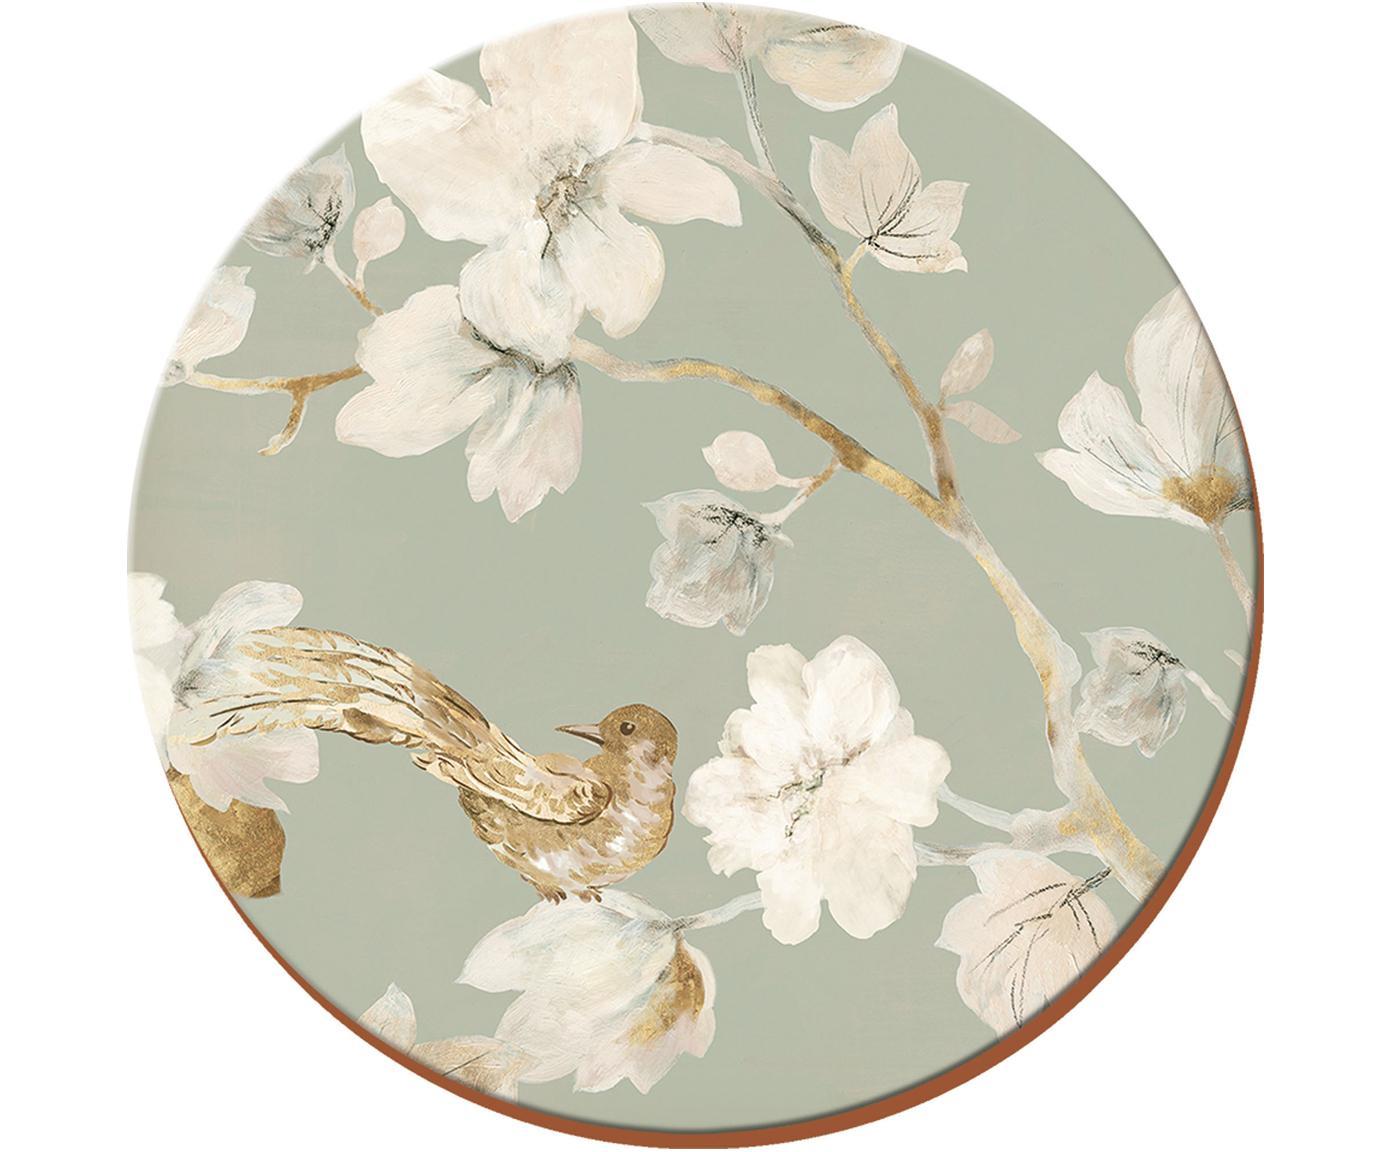 Posavaso Duck Egg Floral, 4uds., Corcho, Gris, blanco, beige, Ø 12 cm